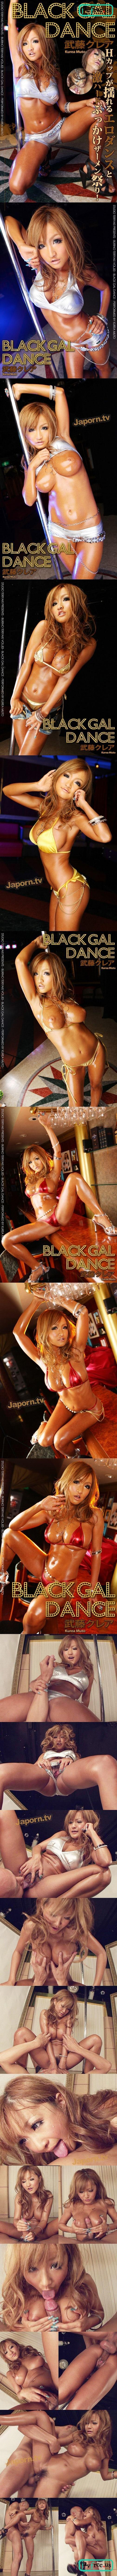 [BT 83] Black Gal Dance : Kurea Muto 武藤クレア Kurea Muto BT